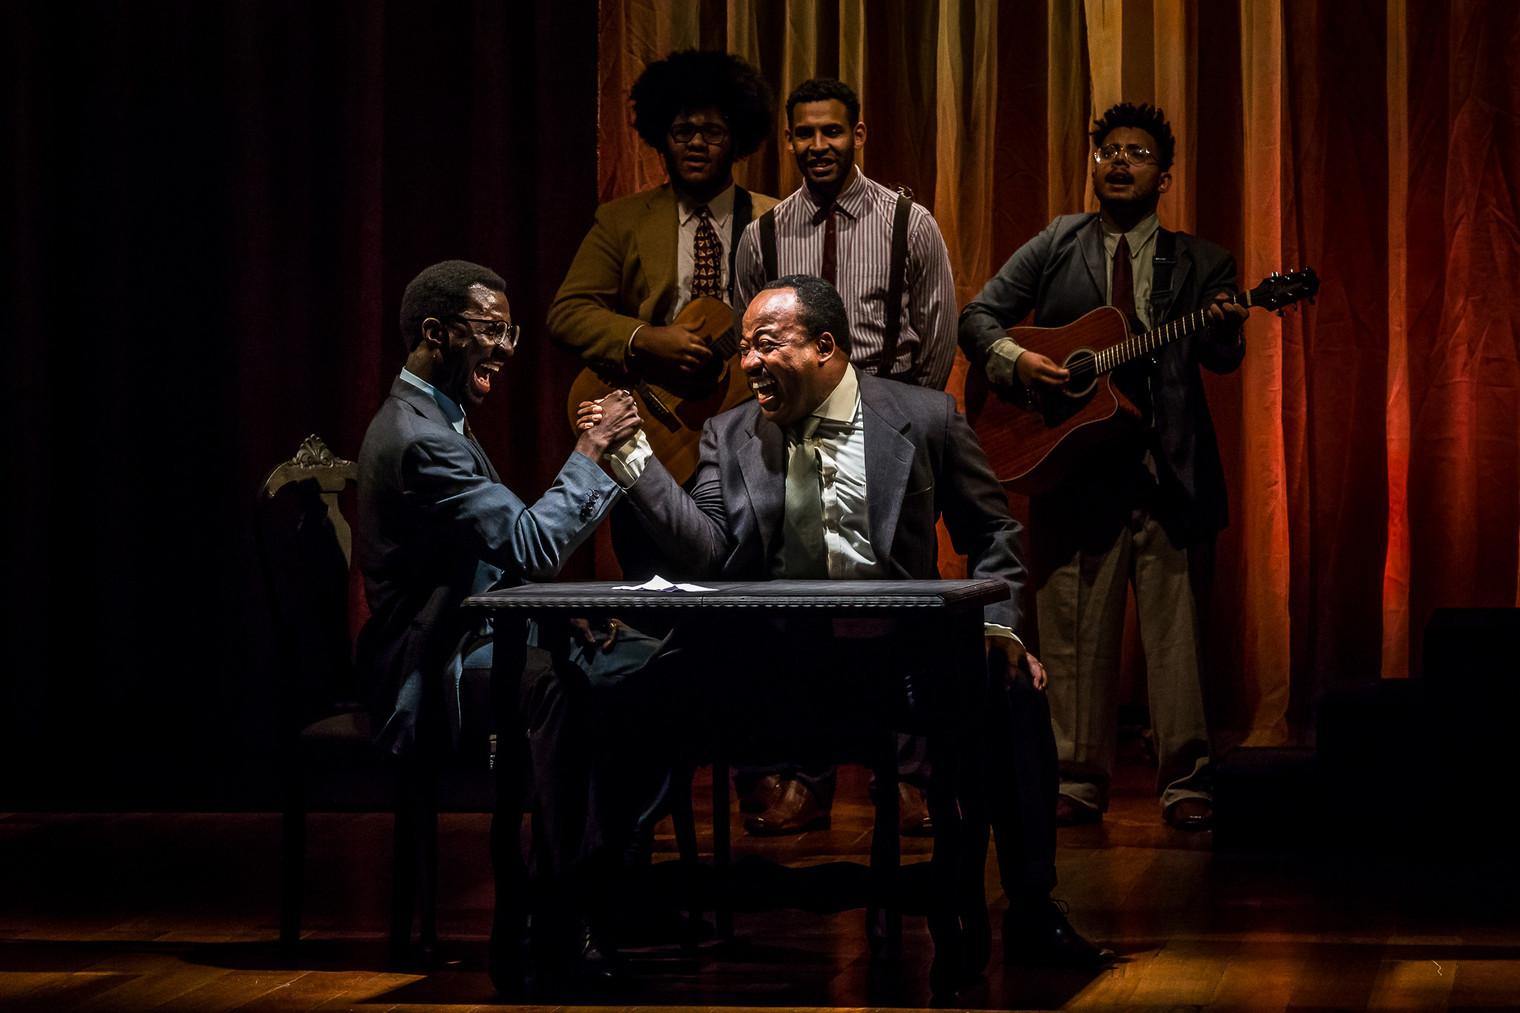 O Encontro – Malcolm X e Martin Luther King Jr